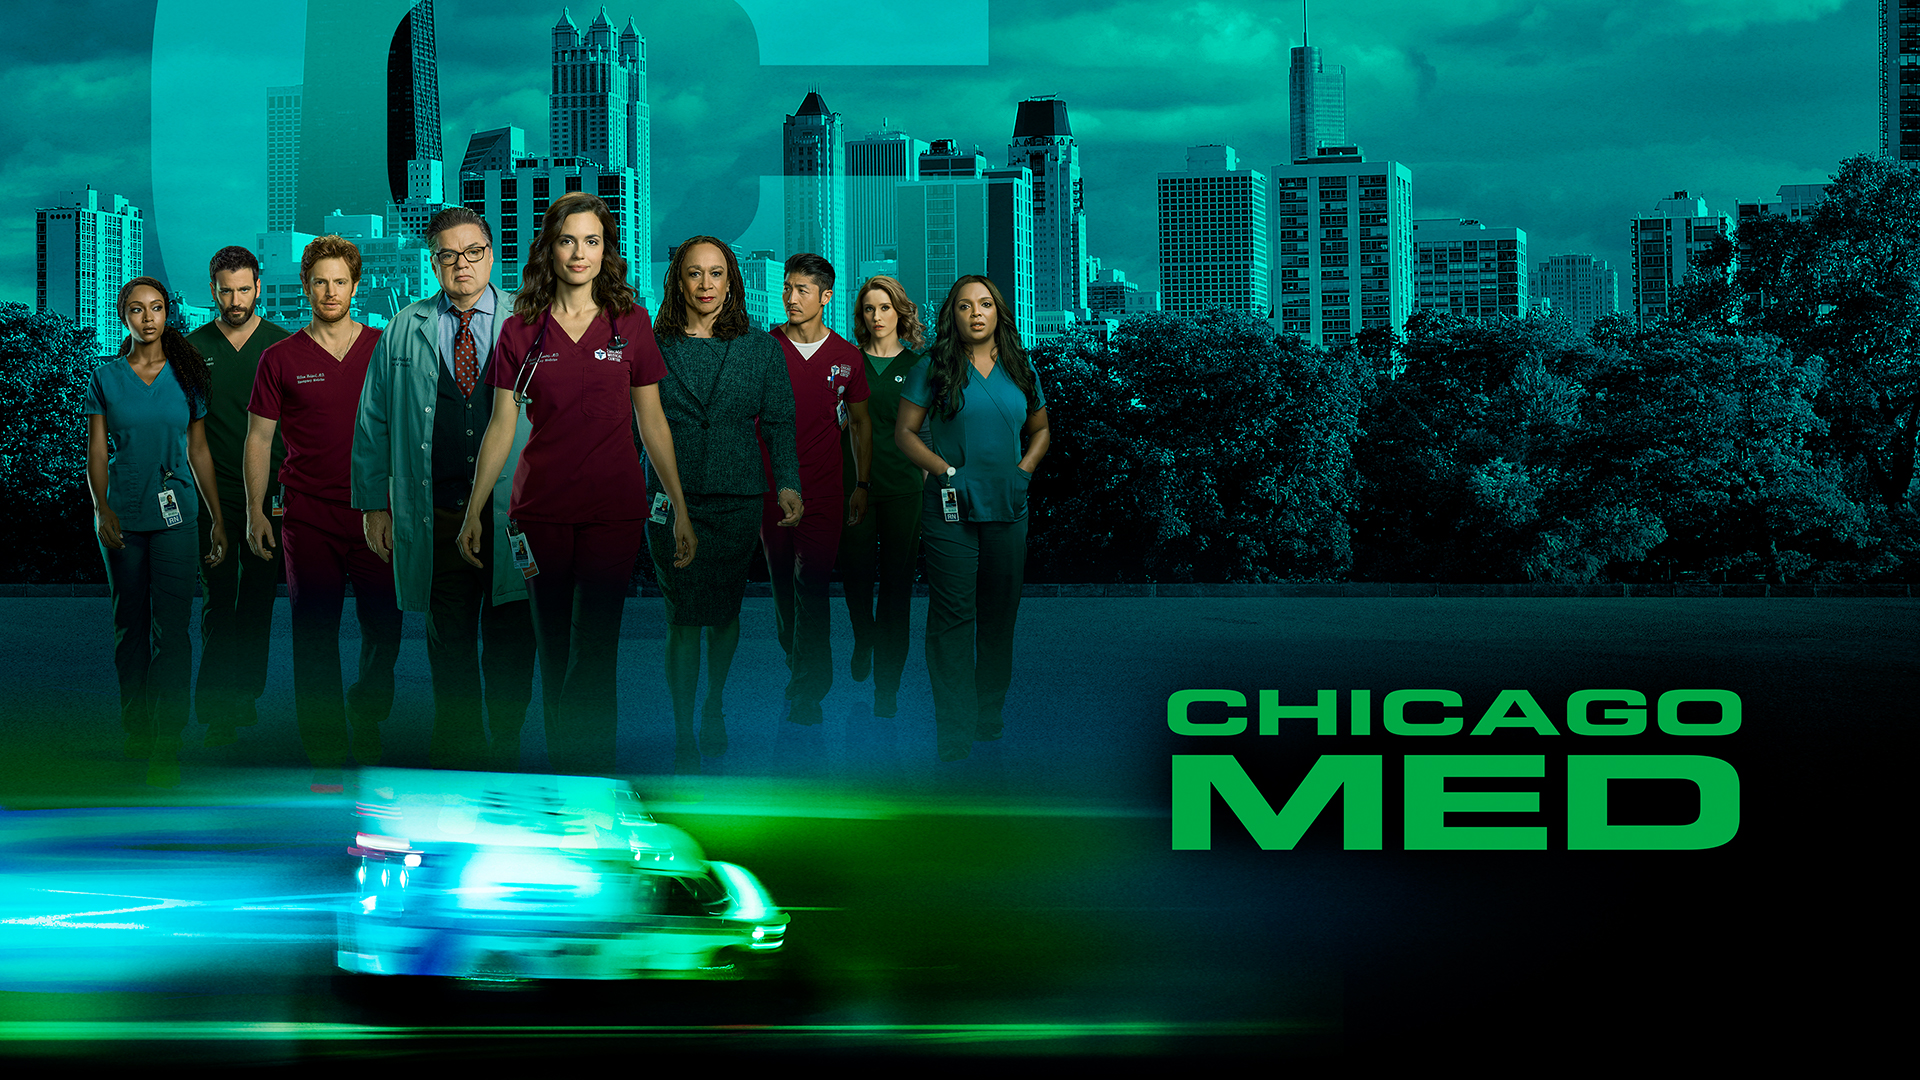 chicago med season 1 episodes